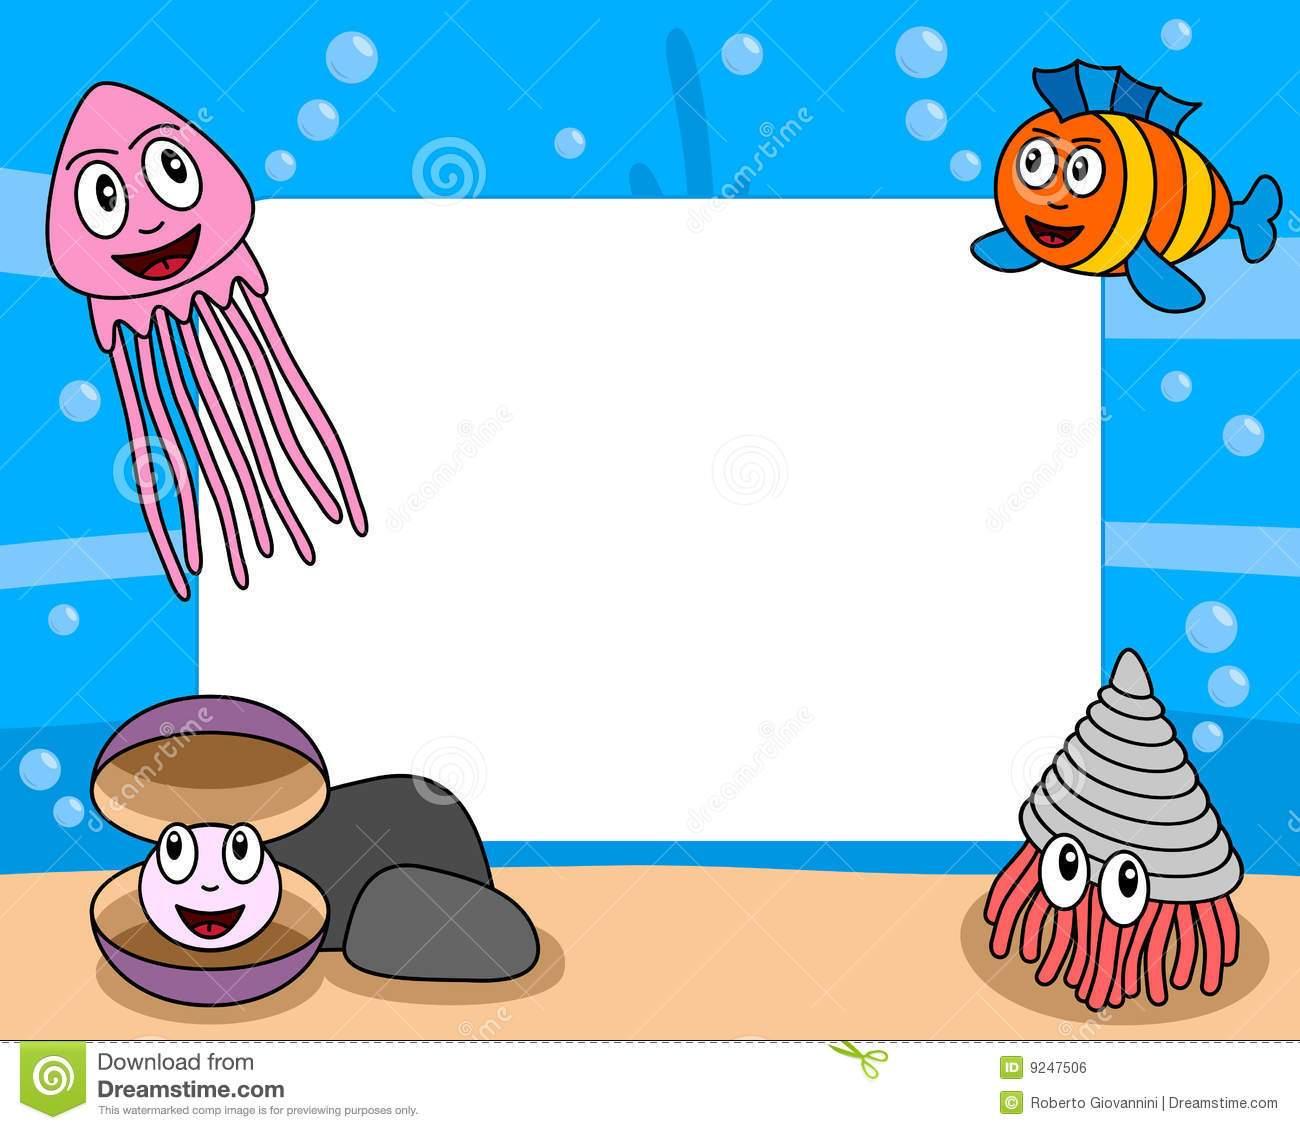 Sea life borders clipart svg black and white stock Sea life clipart borders 2 » Clipart Portal svg black and white stock